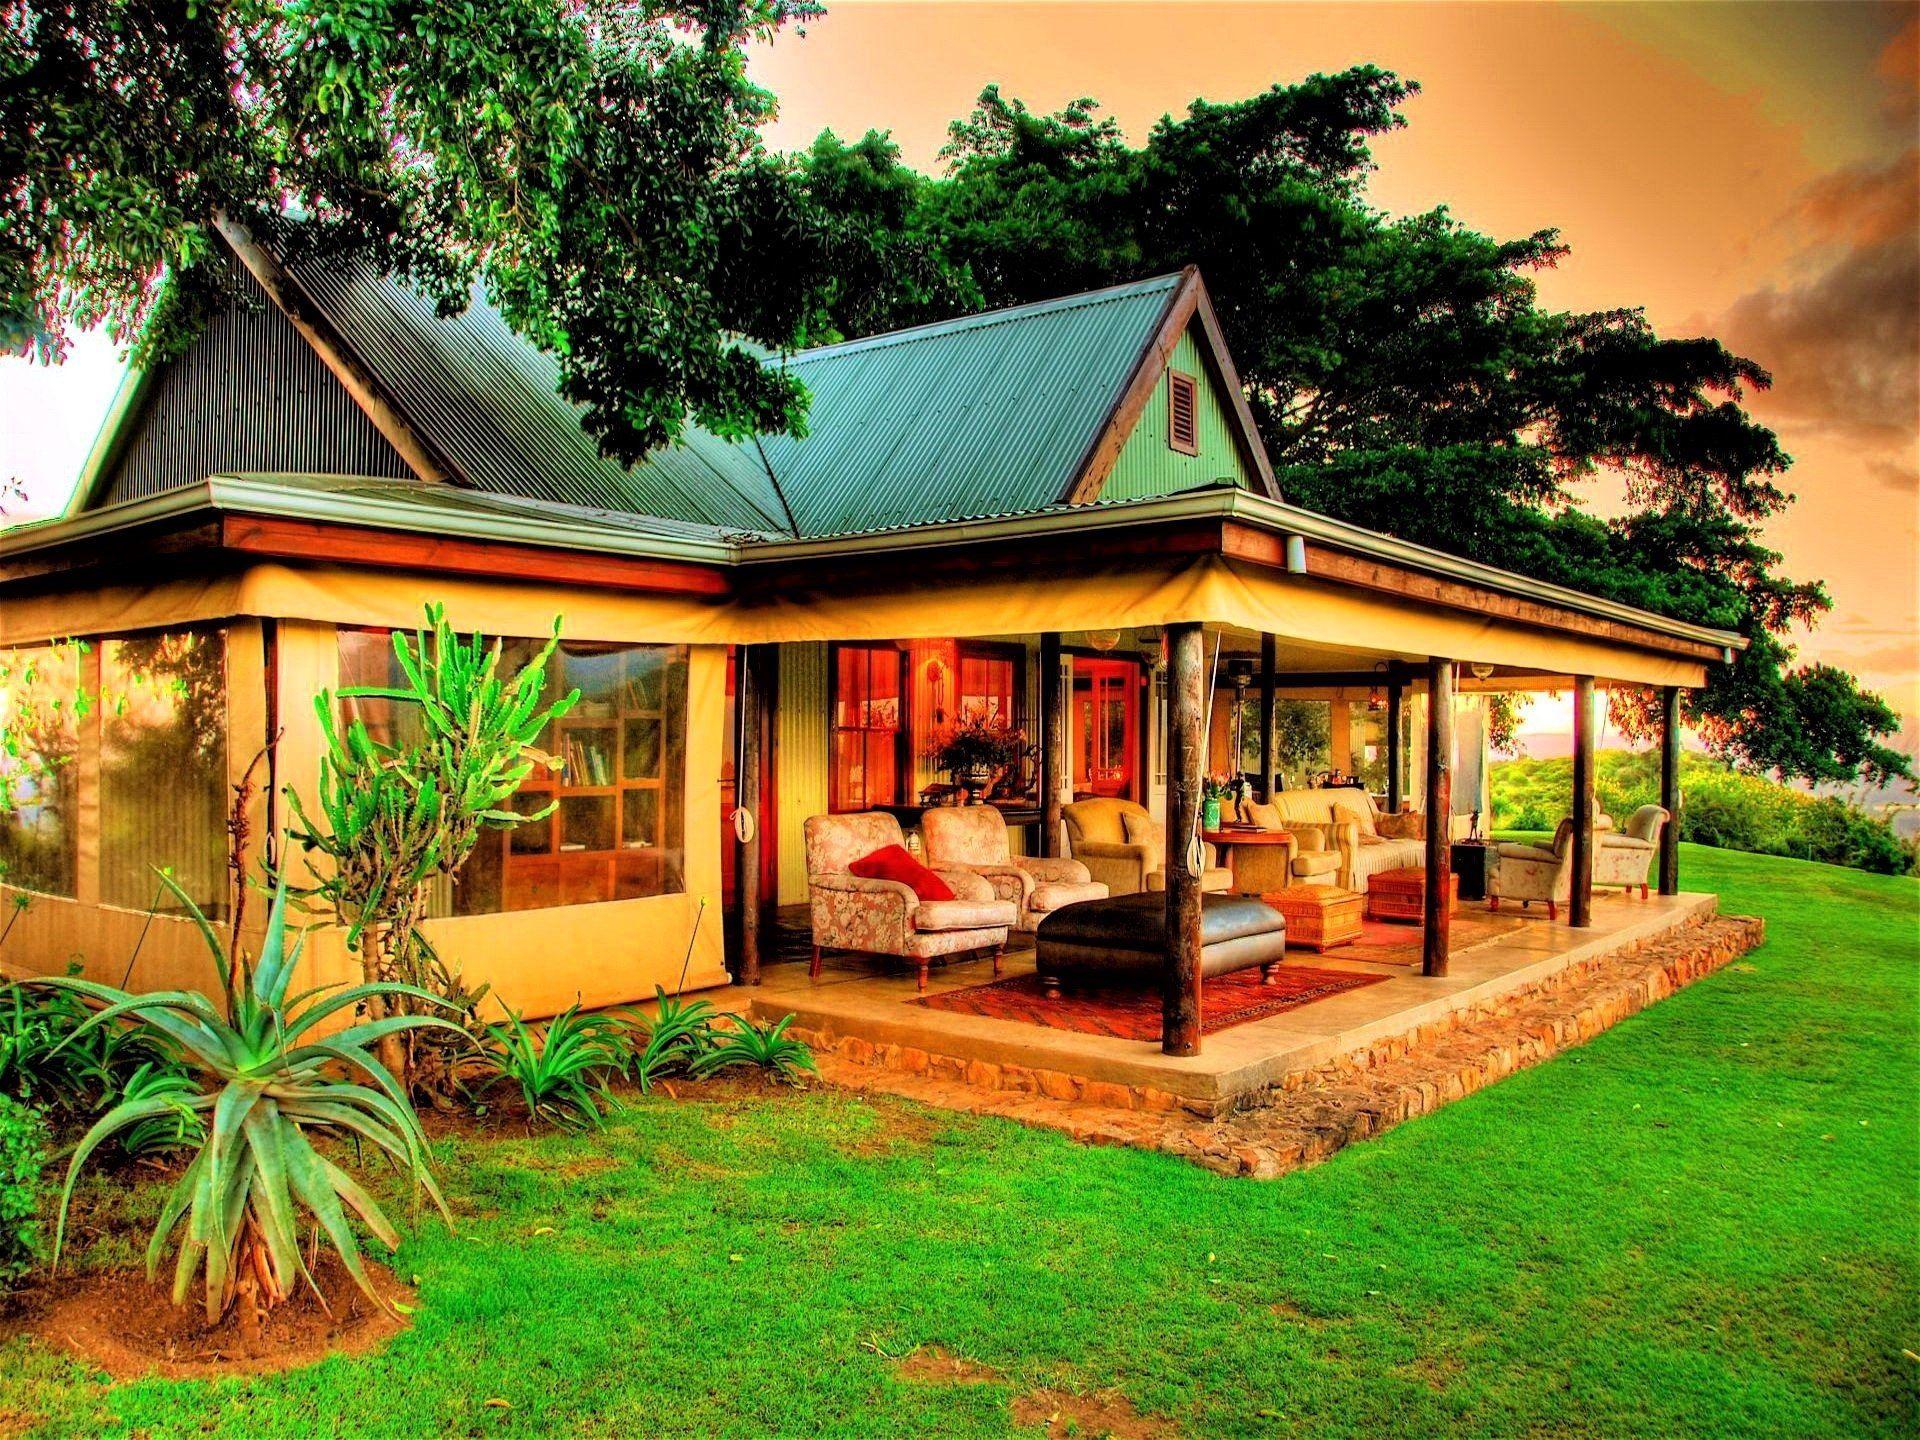 Man made house caribbean tropical porch wallpaper